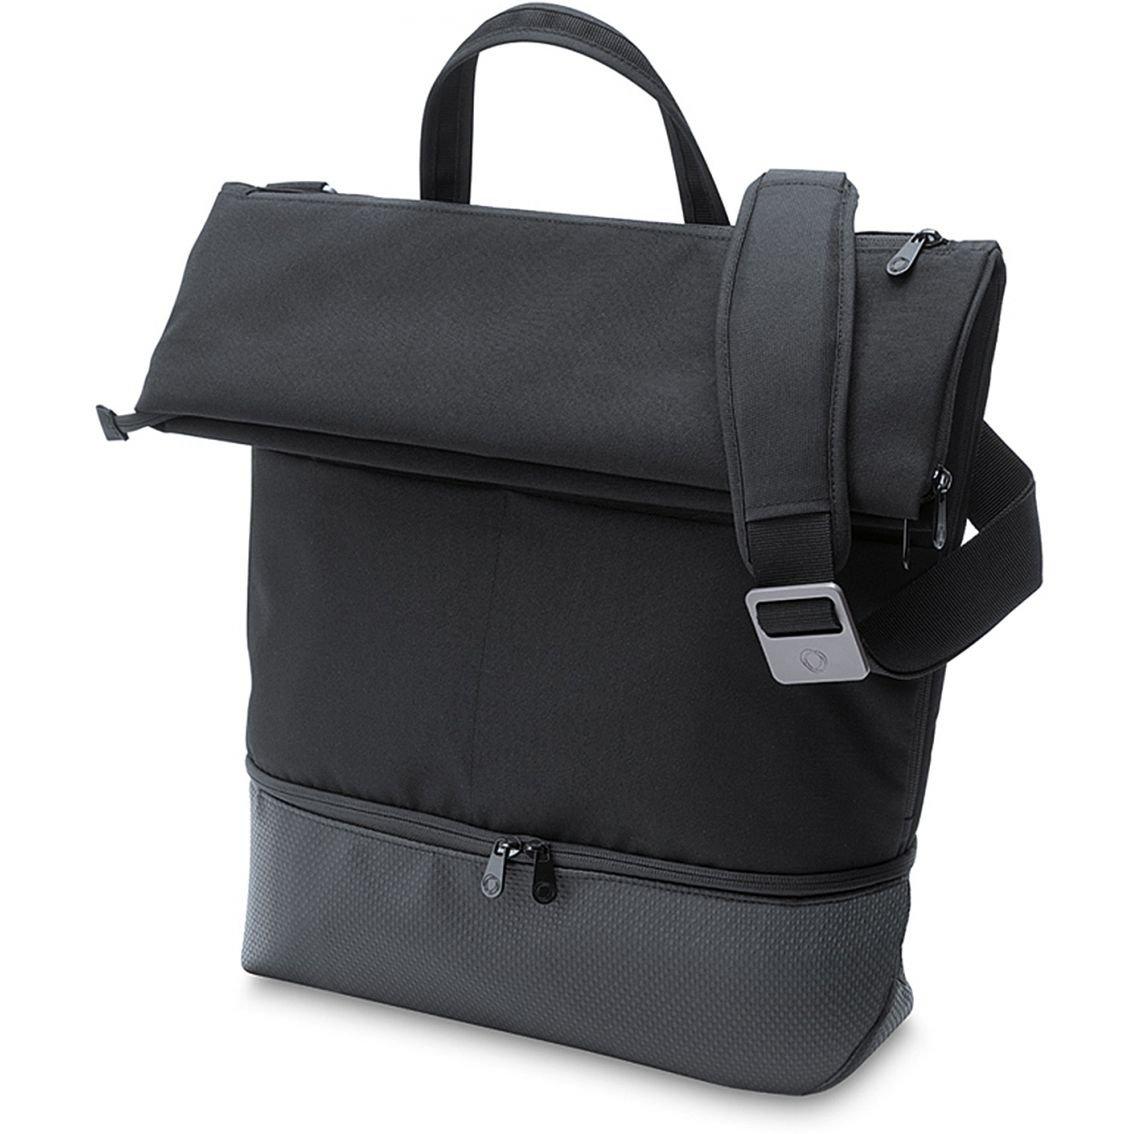 Bugaboo Bag - Black